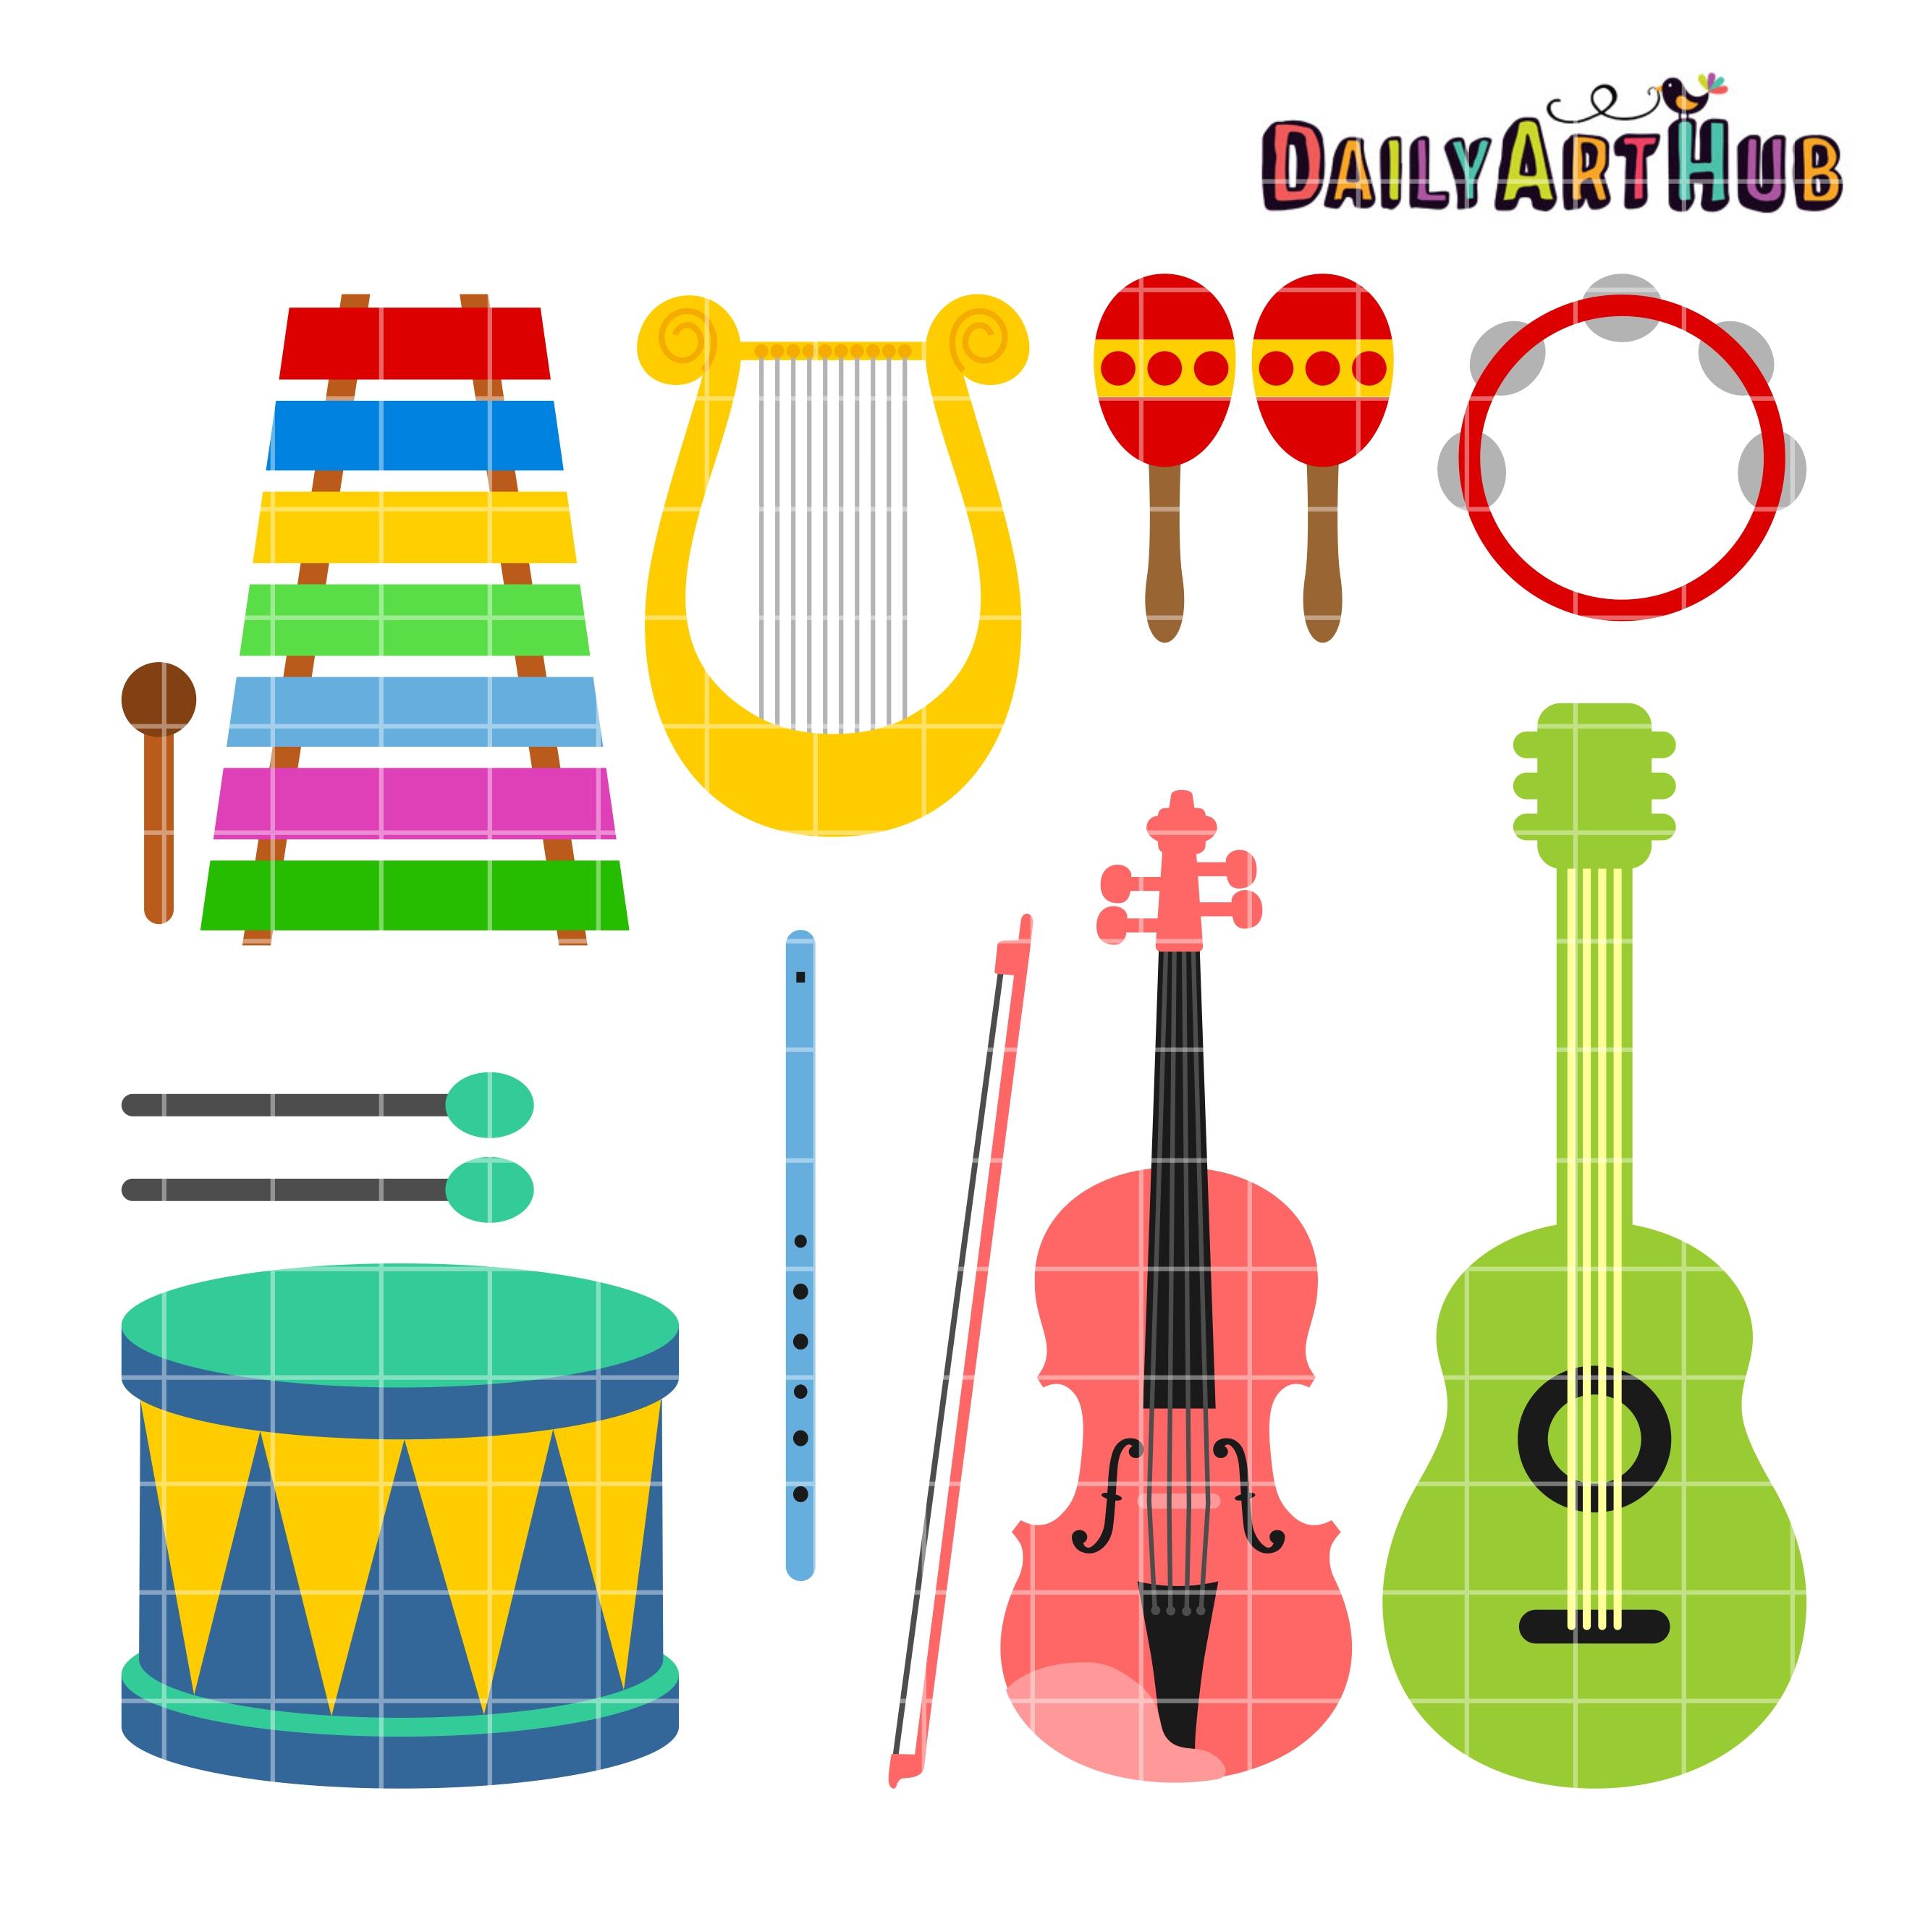 Musical Instruments Clipart Musical Instruments Clip Art 2664 x 2670